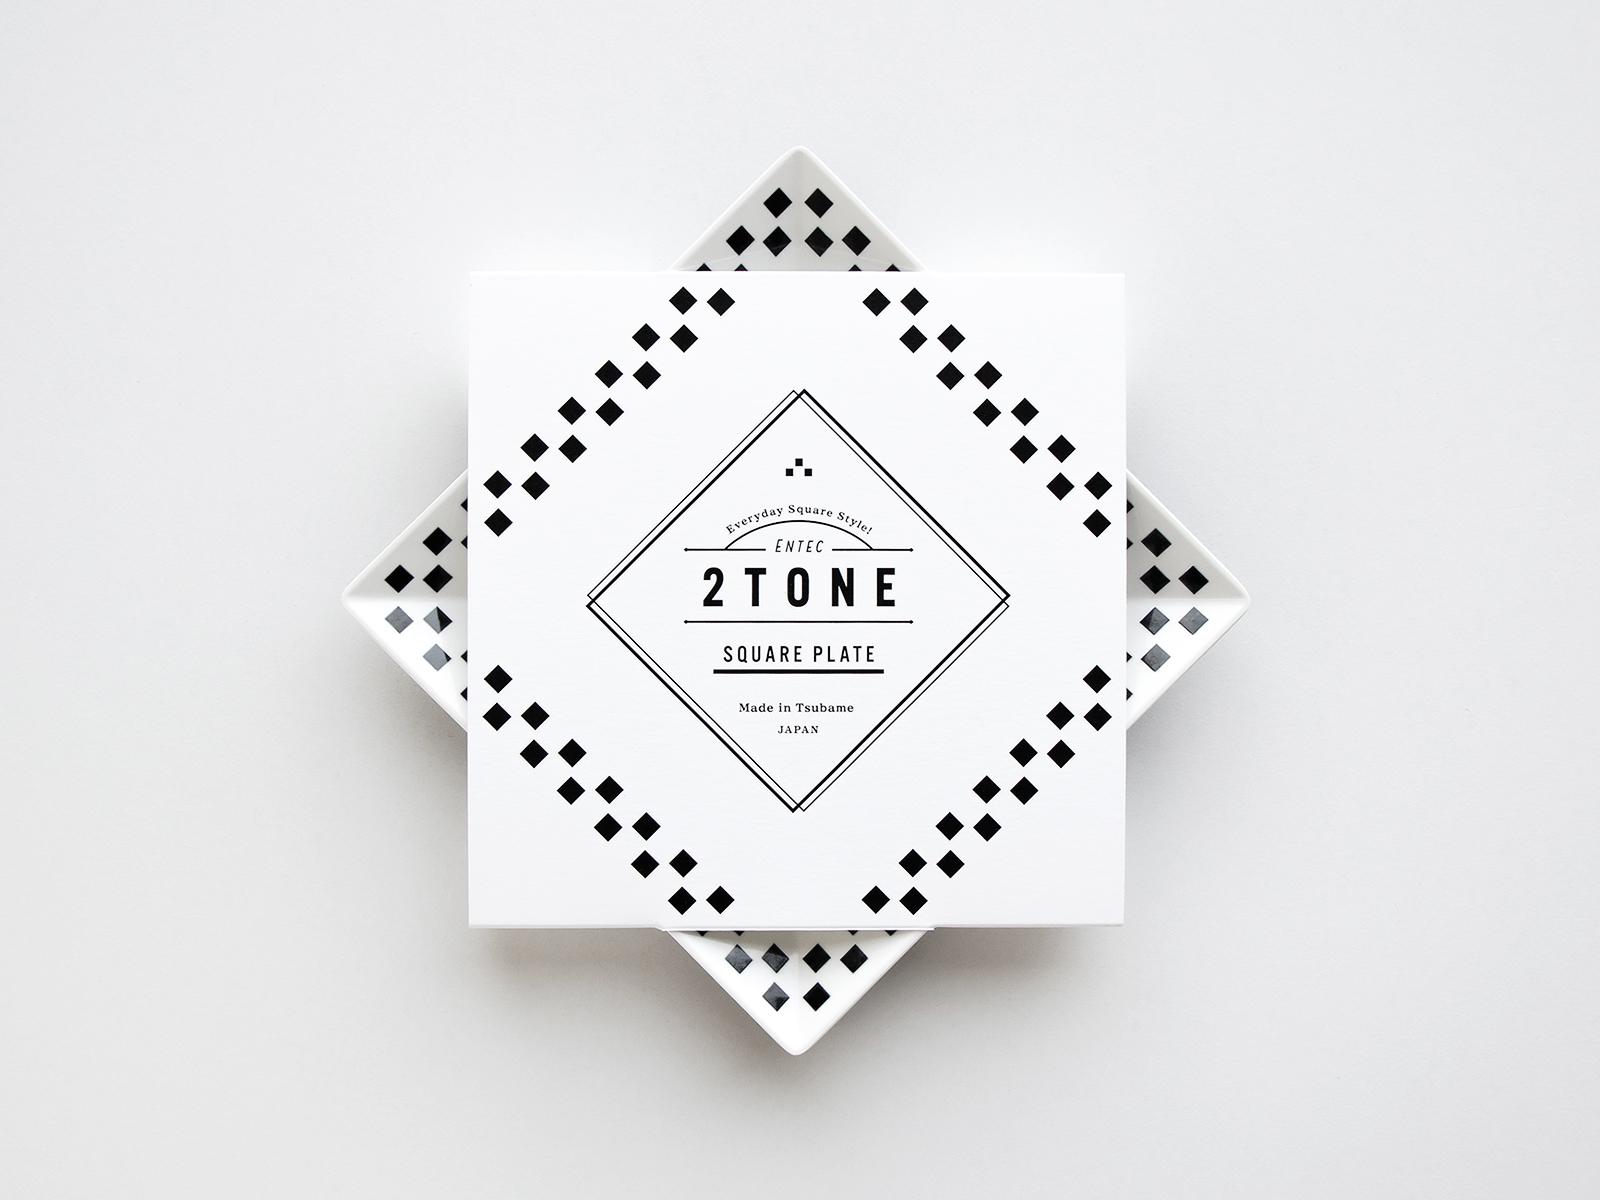 2TONEシリーズ パッケージデザイン